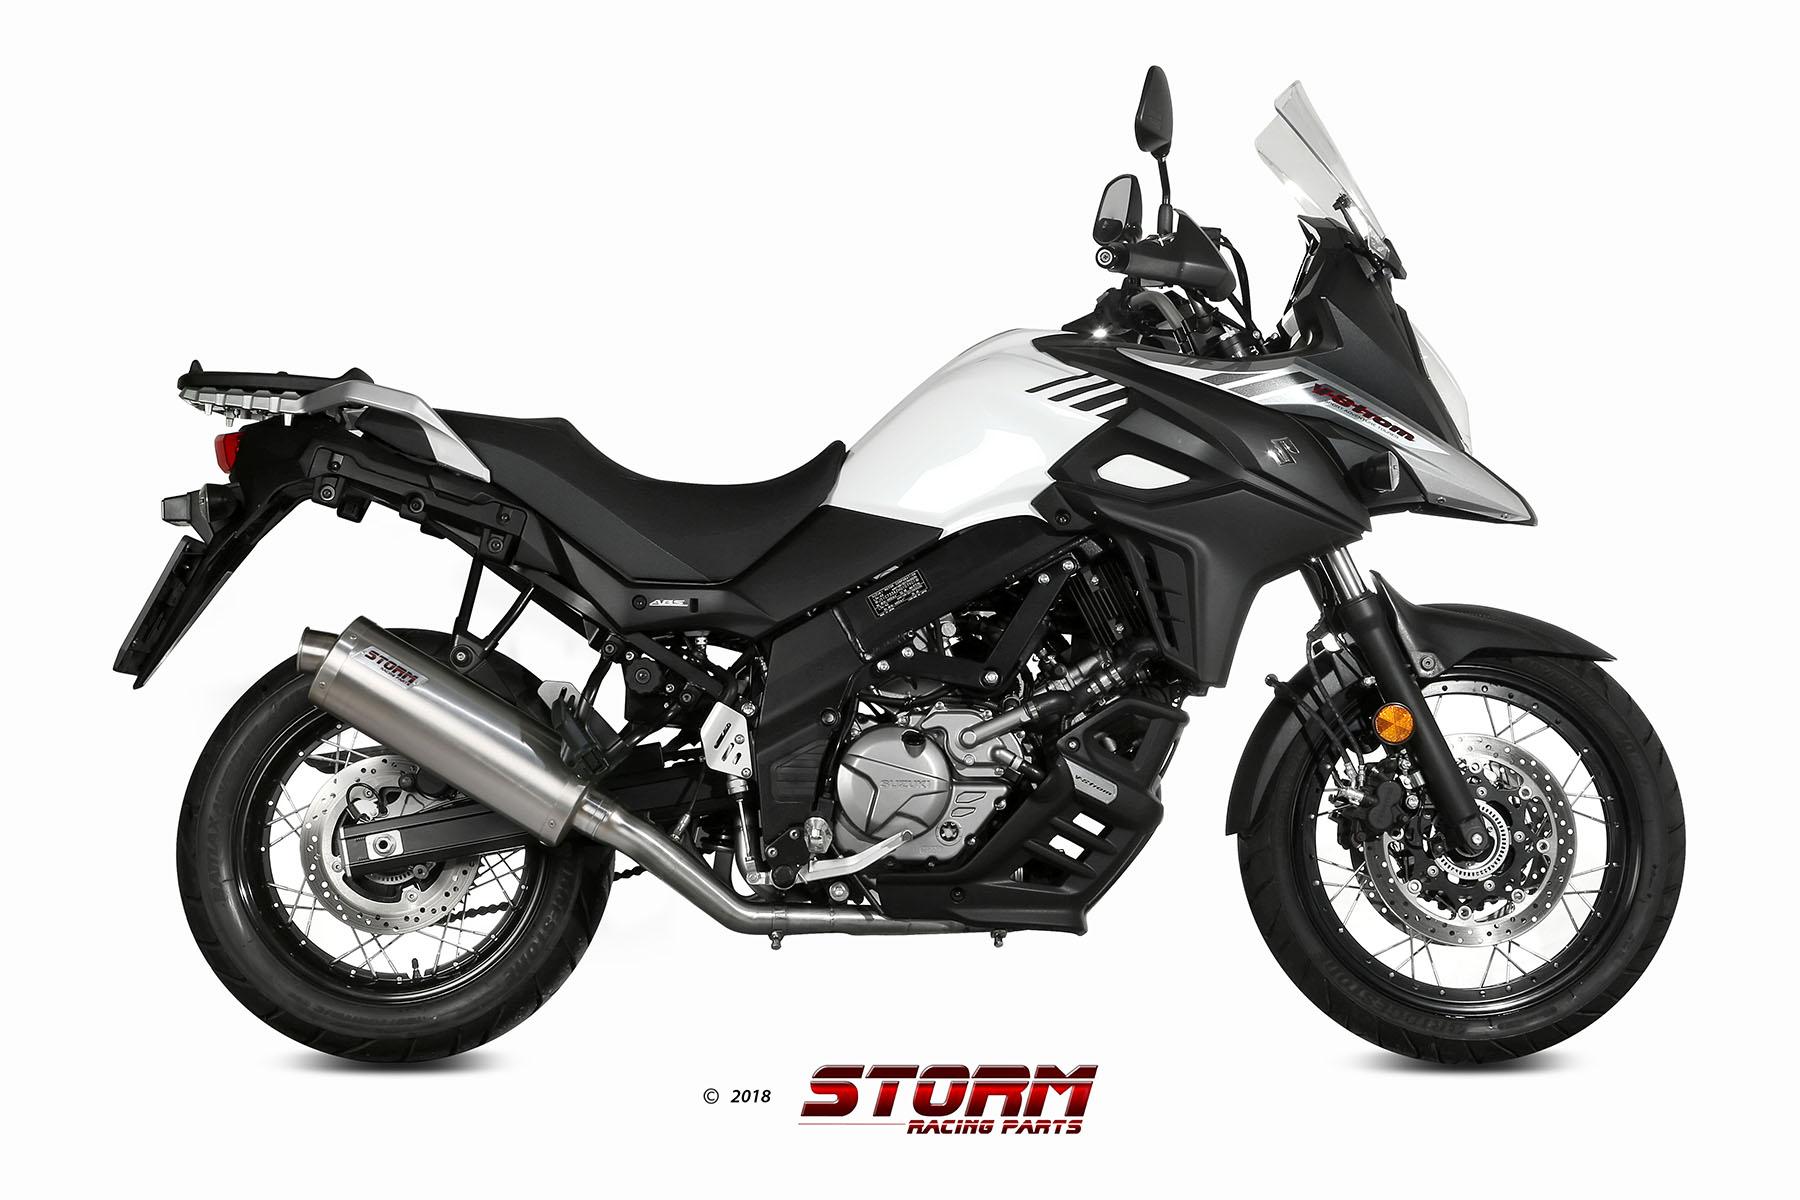 SUZUKI DL V-STROM 650 Exhaust Storm Oval Stainless steel 74.S.049.LX2